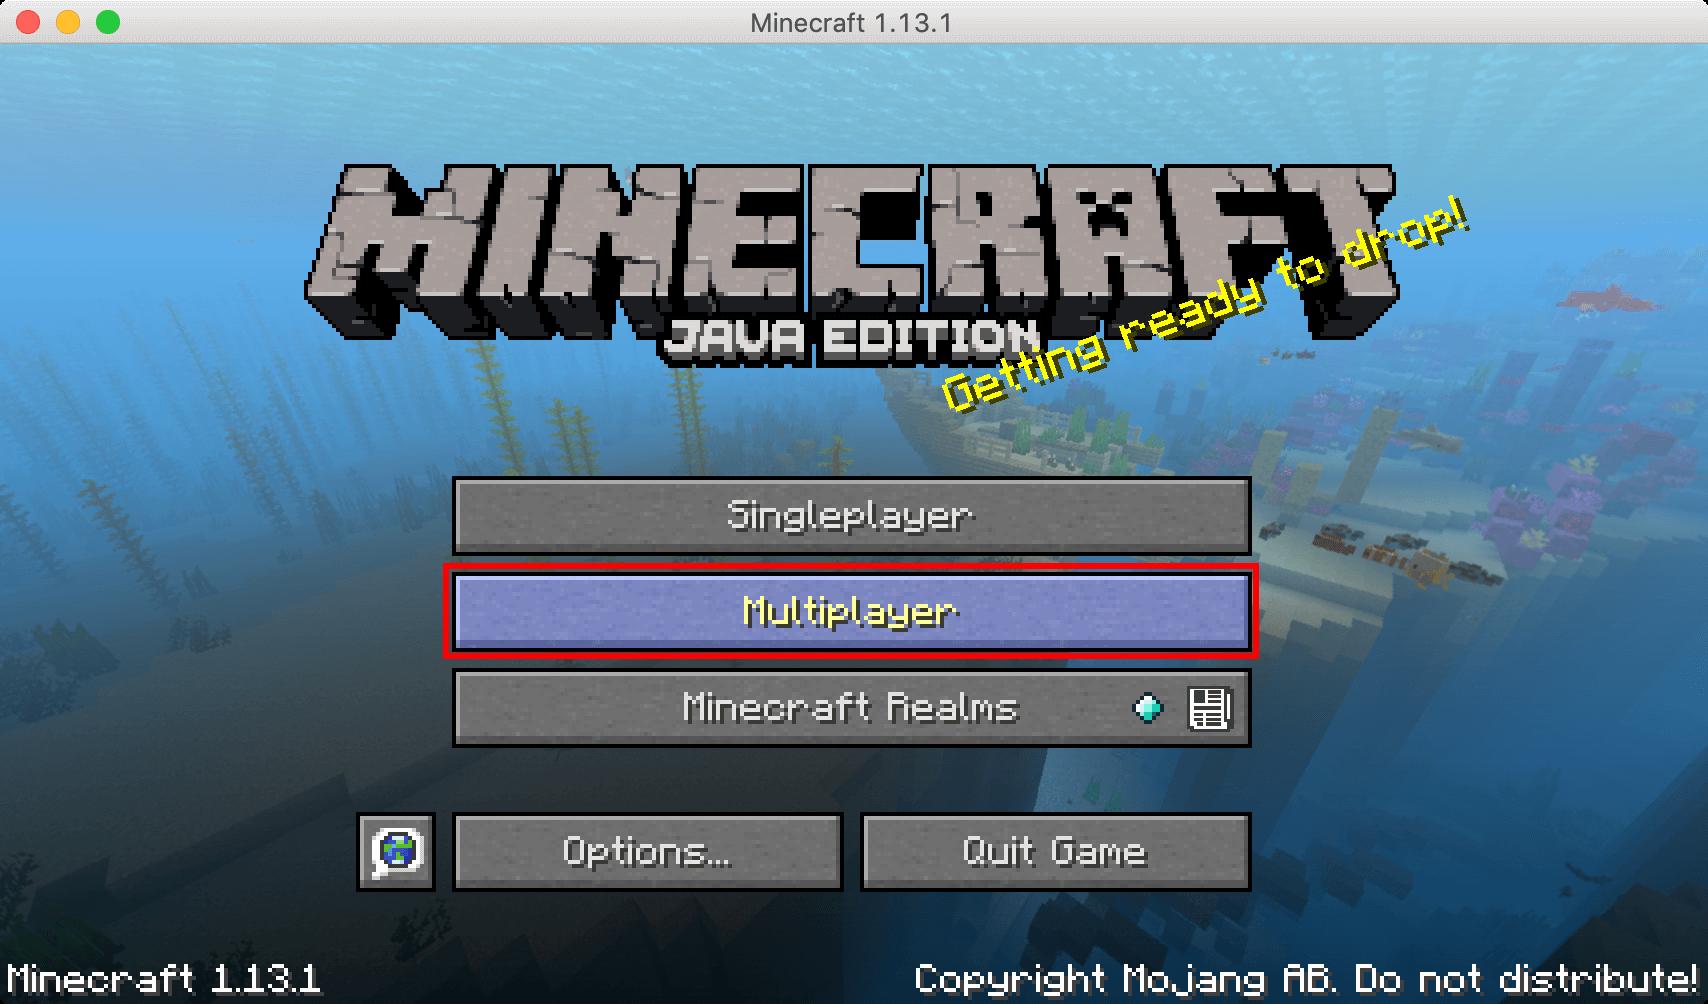 「Multiplayer」を選択